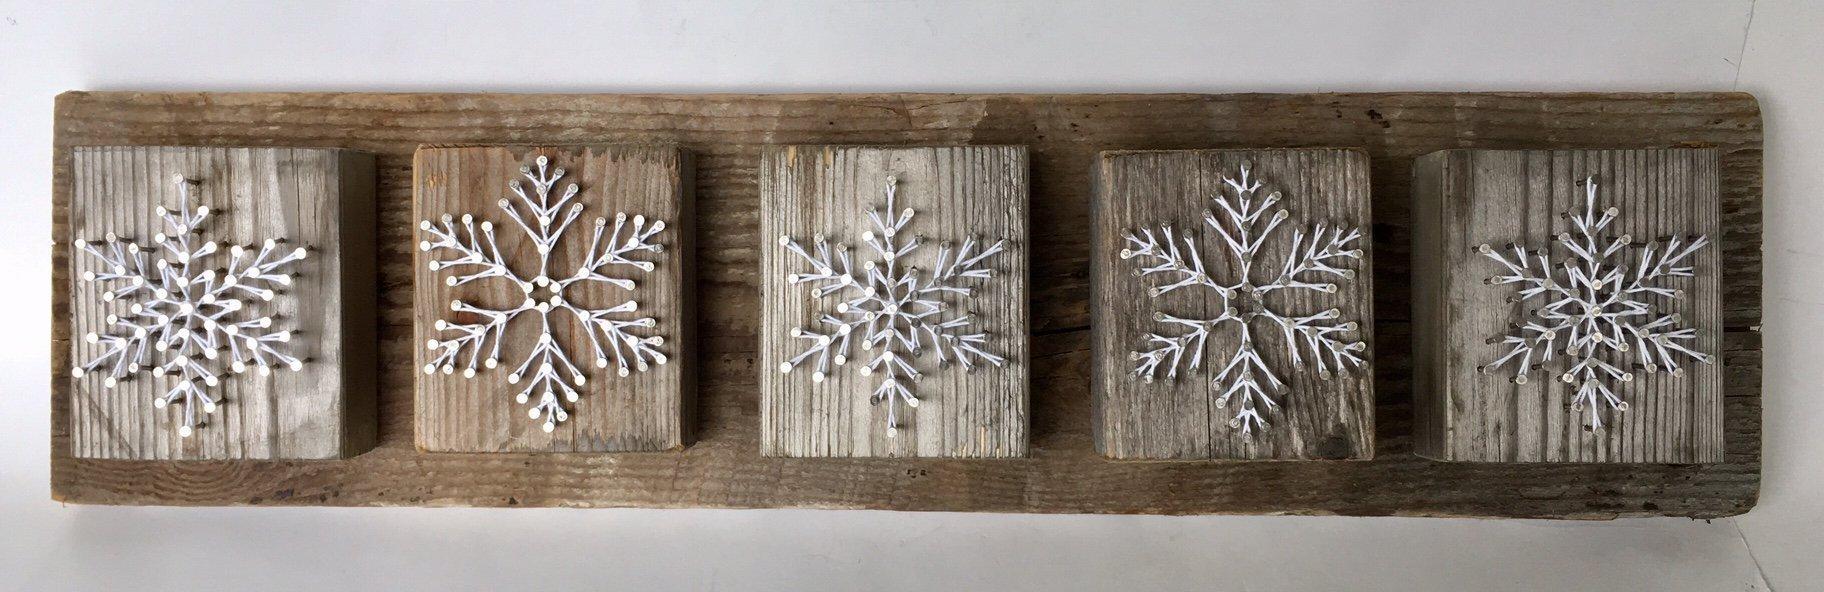 Snowflake string Art ''winter wonderland'' home decor wall hanging. by Nail it Art